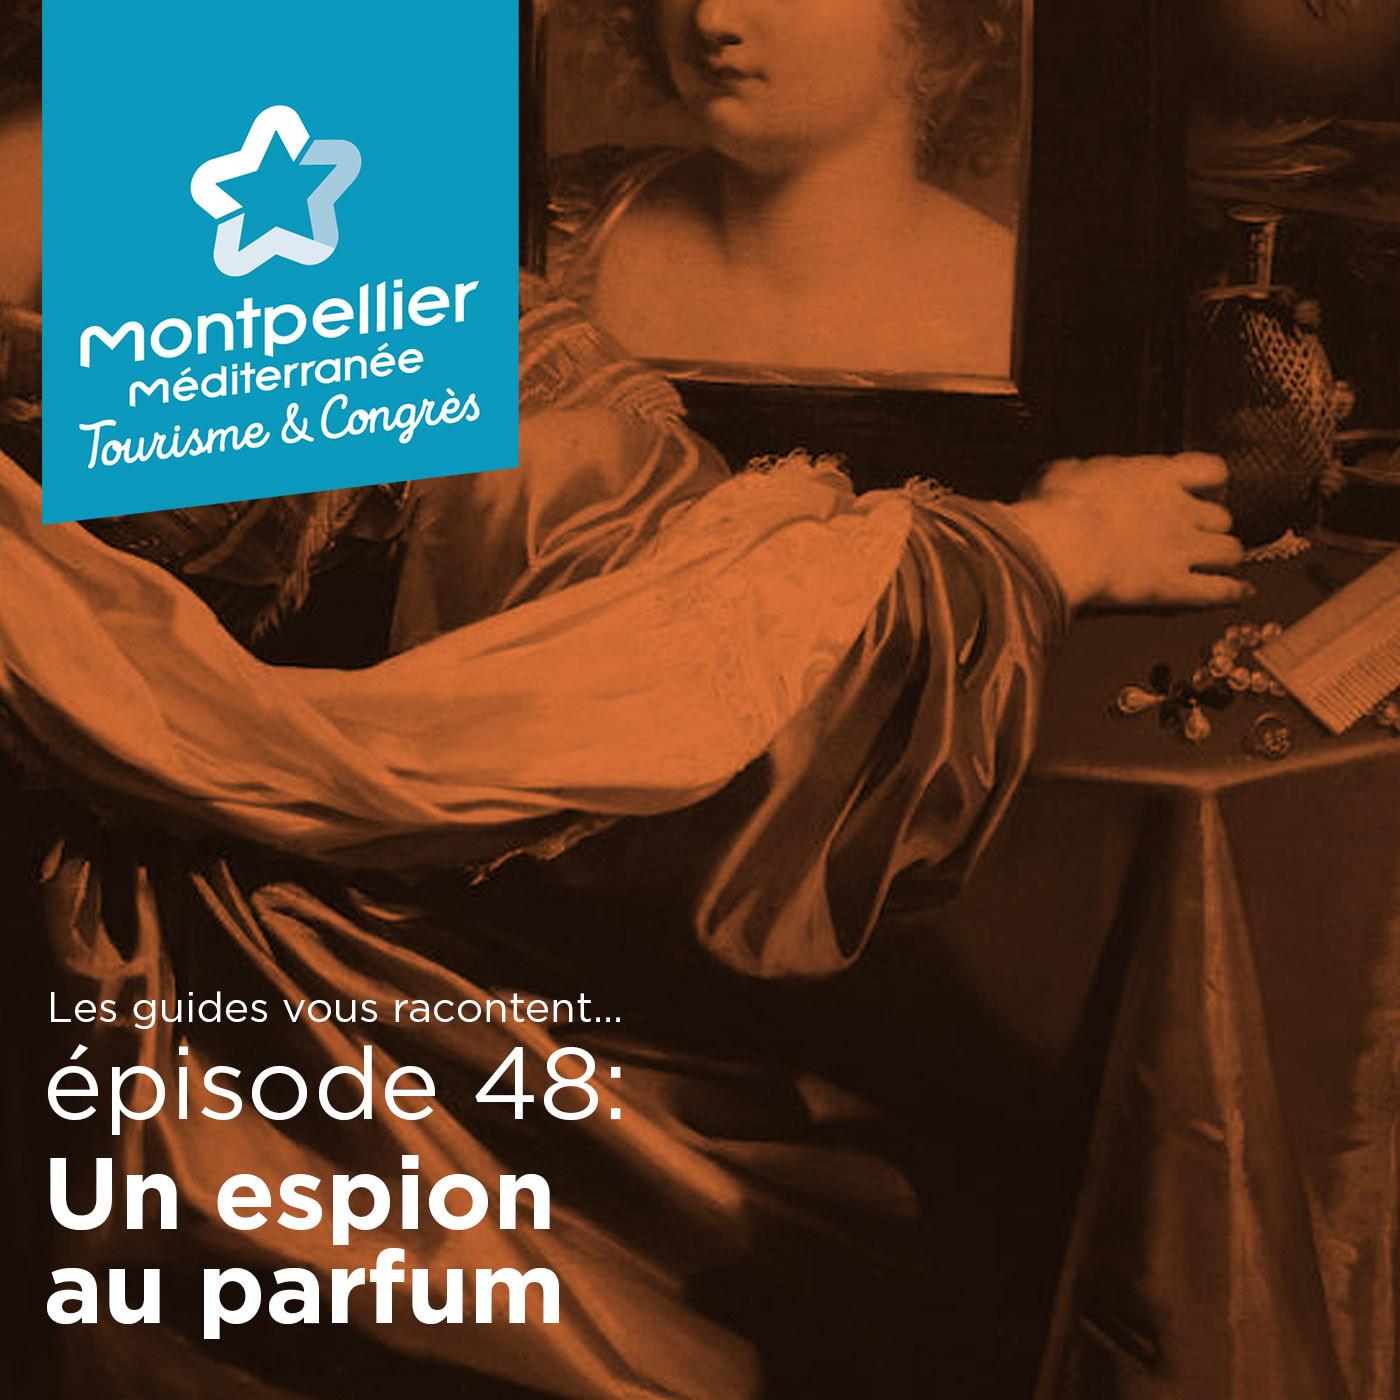 Episode 48: Un espion au parfum